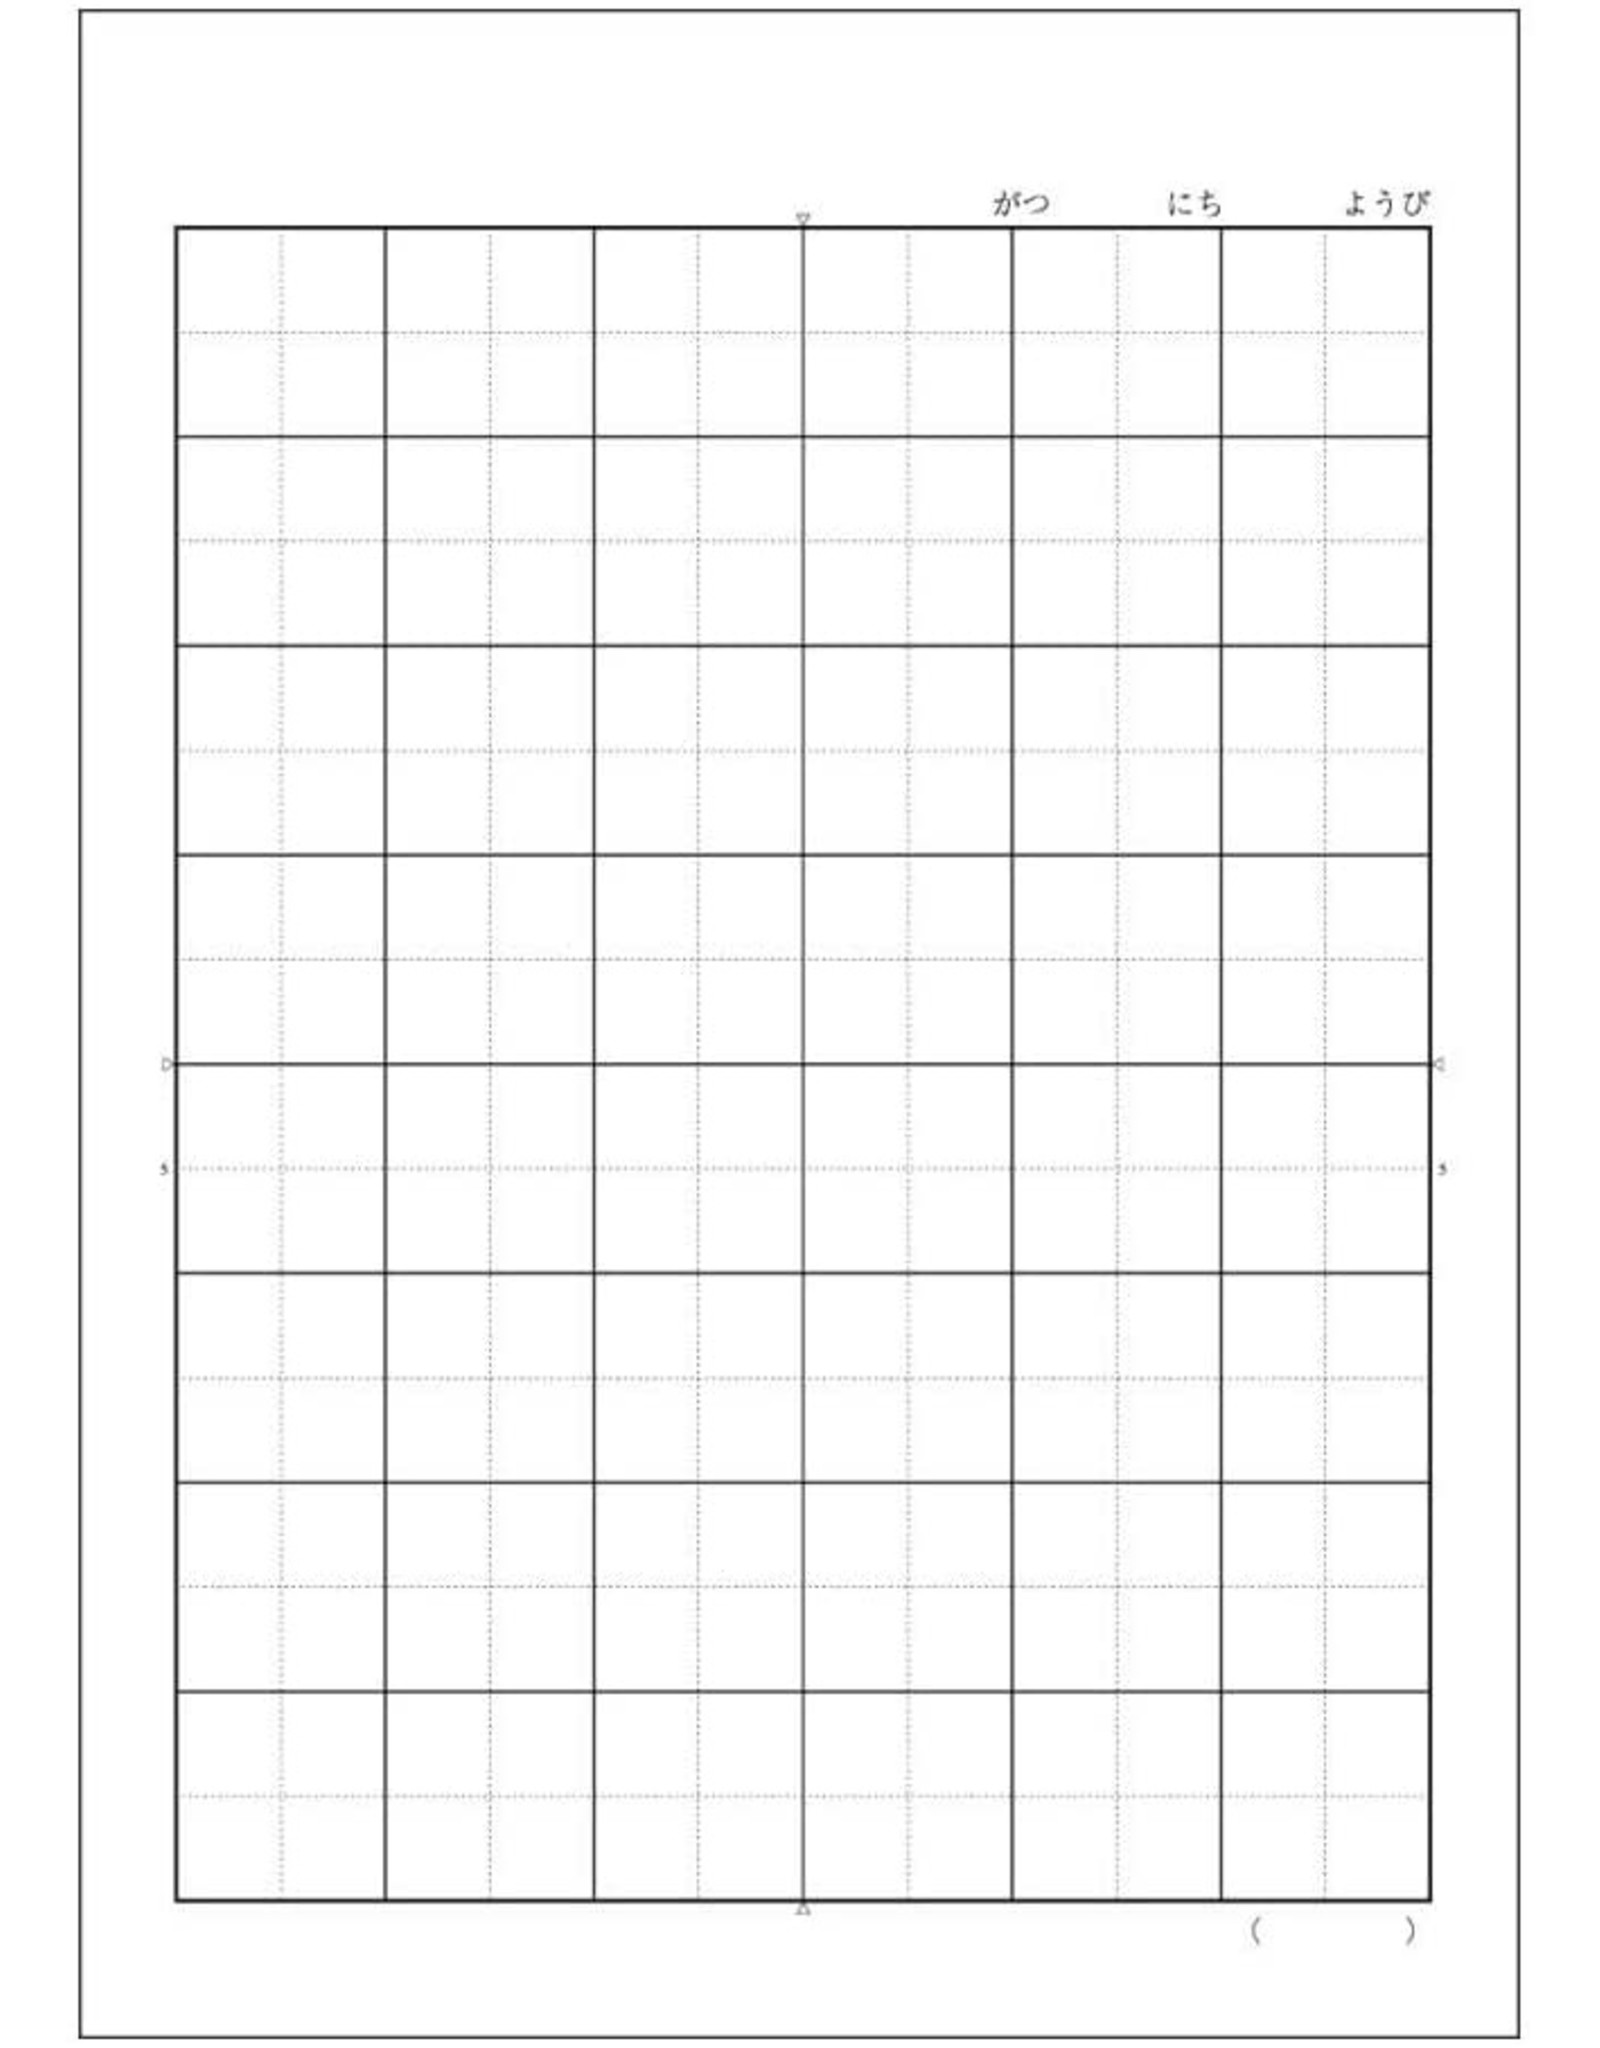 APICA Co., Ltd. APICA JAPANESE NOTEBOOK 8 SQUARES